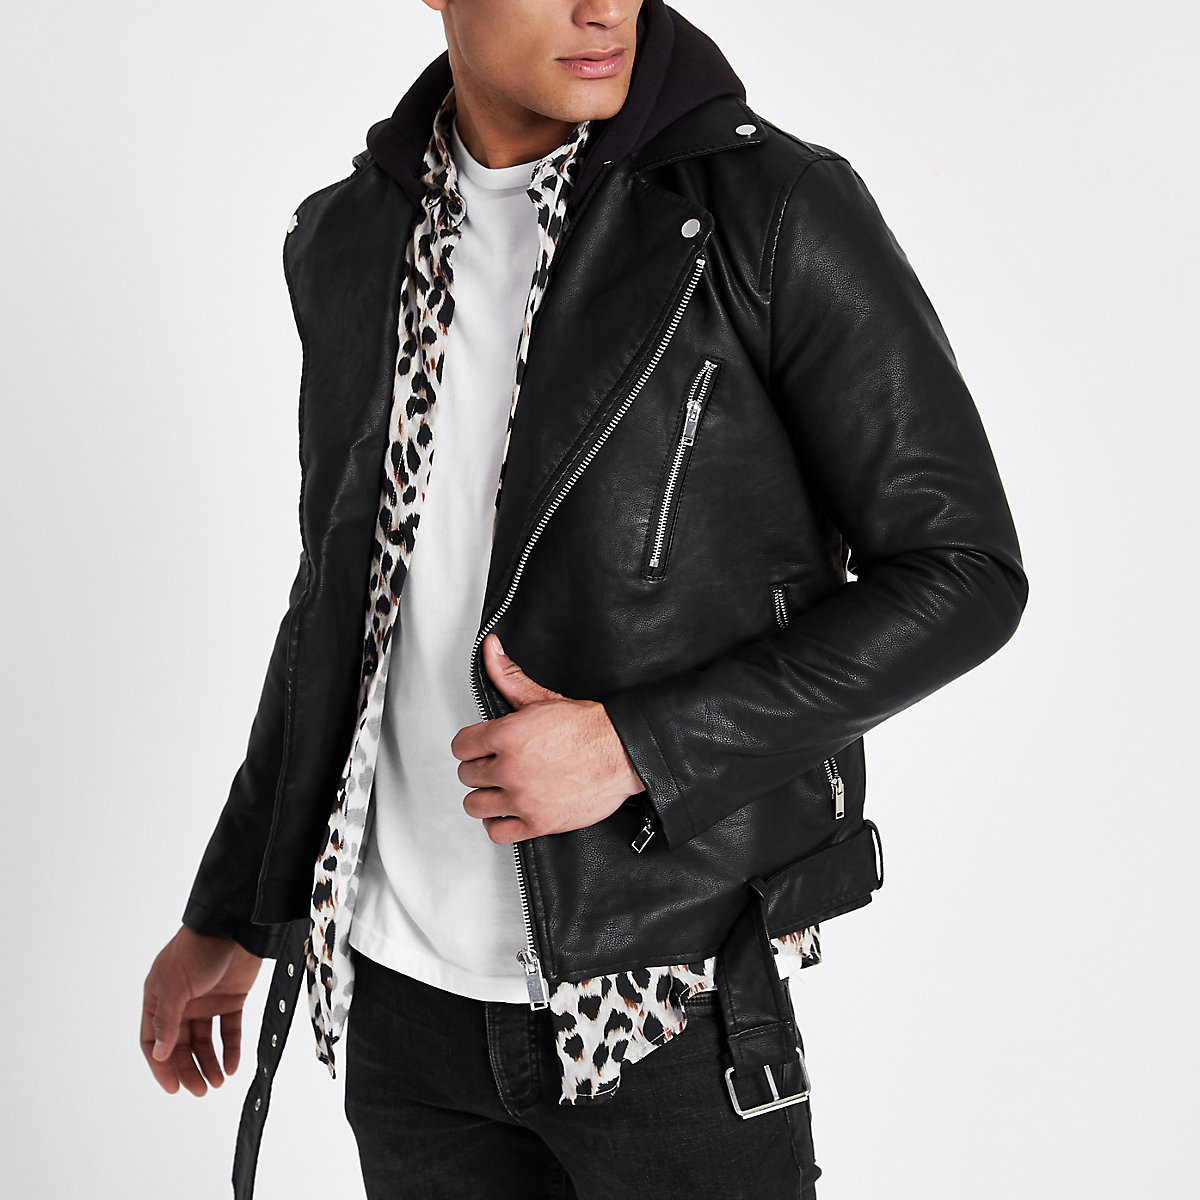 Black hooded faux leather biker jacket